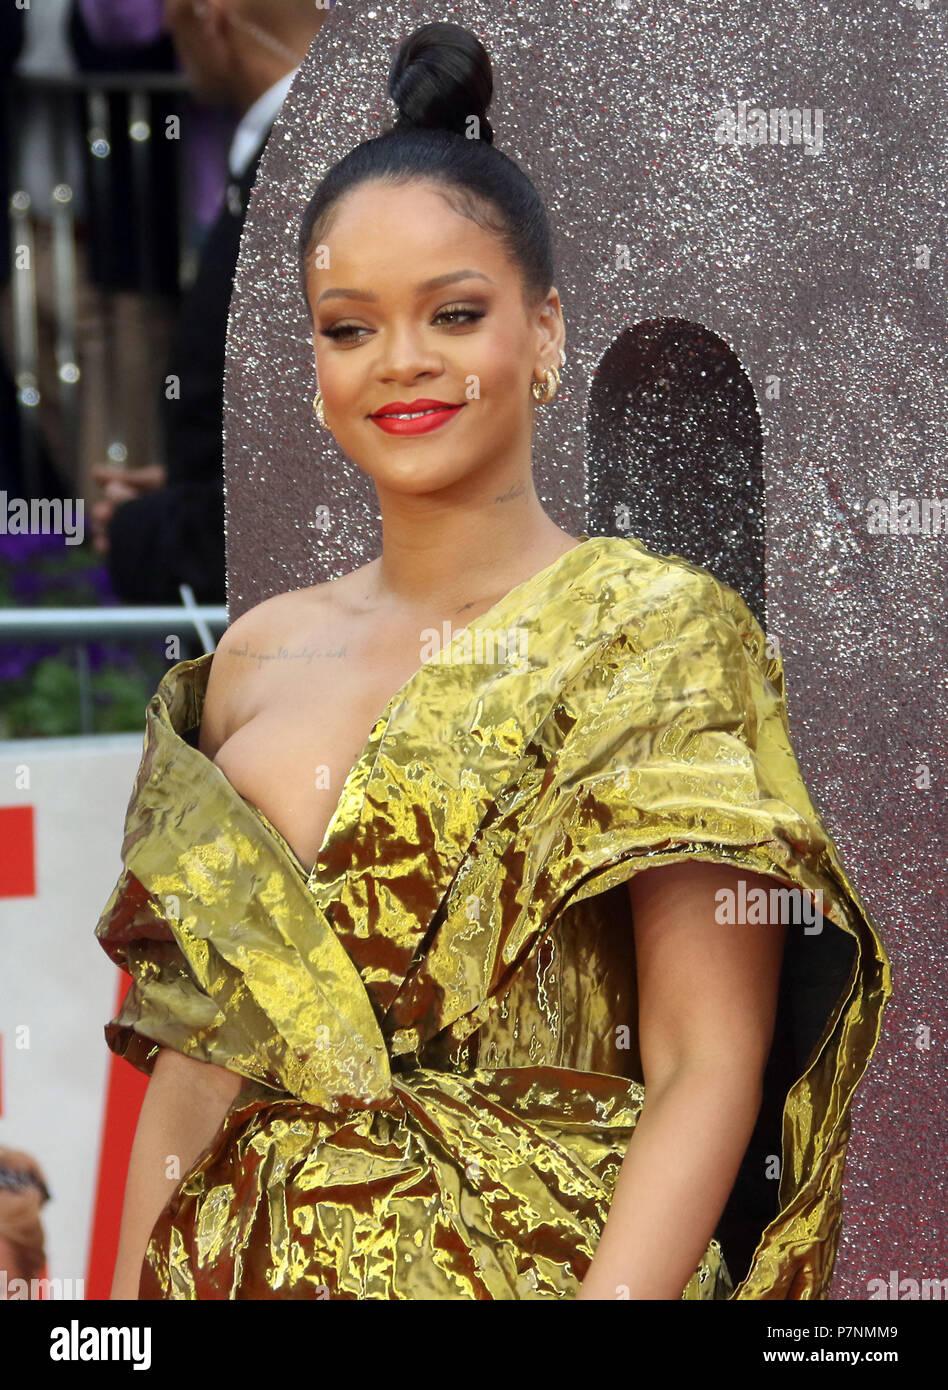 Jun 13, 2018  - Rihanna attending Ocean's 8 European Premiere, Cineworld Leicester Square in London, England, UK - Stock Image